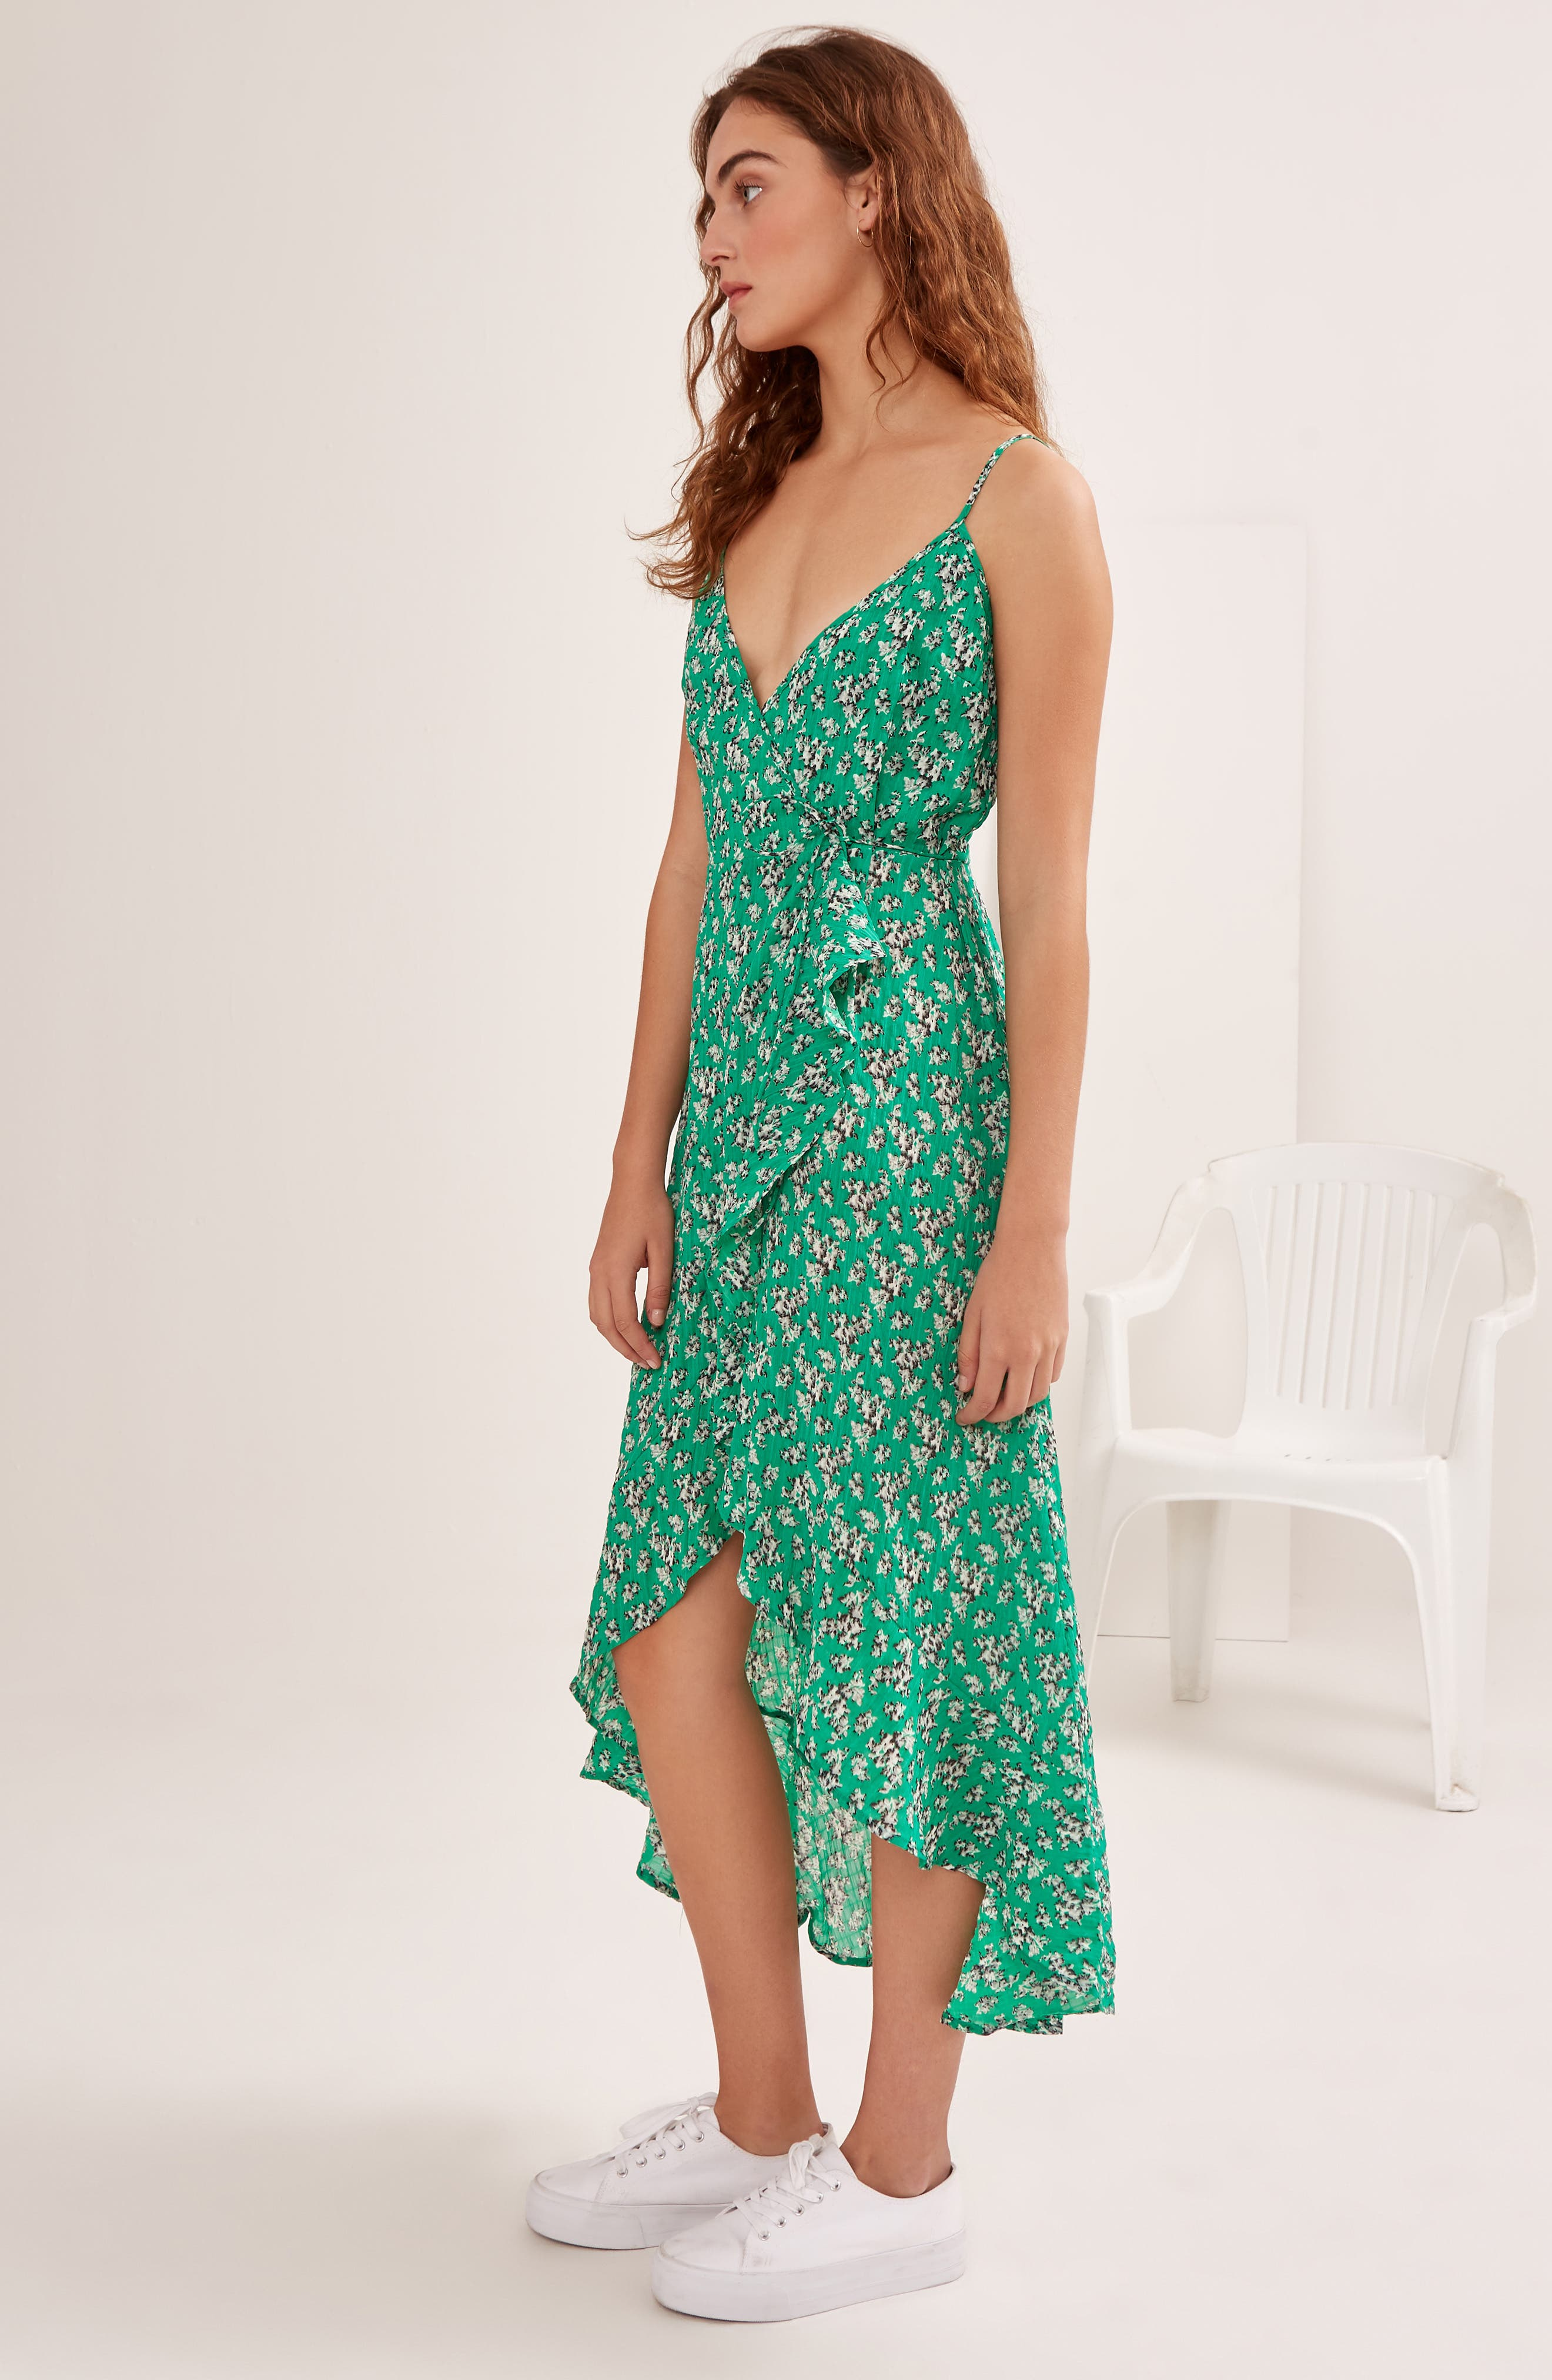 Adventurer Floral Print High/Low Dress,                             Alternate thumbnail 8, color,                             GREEN FLORAL